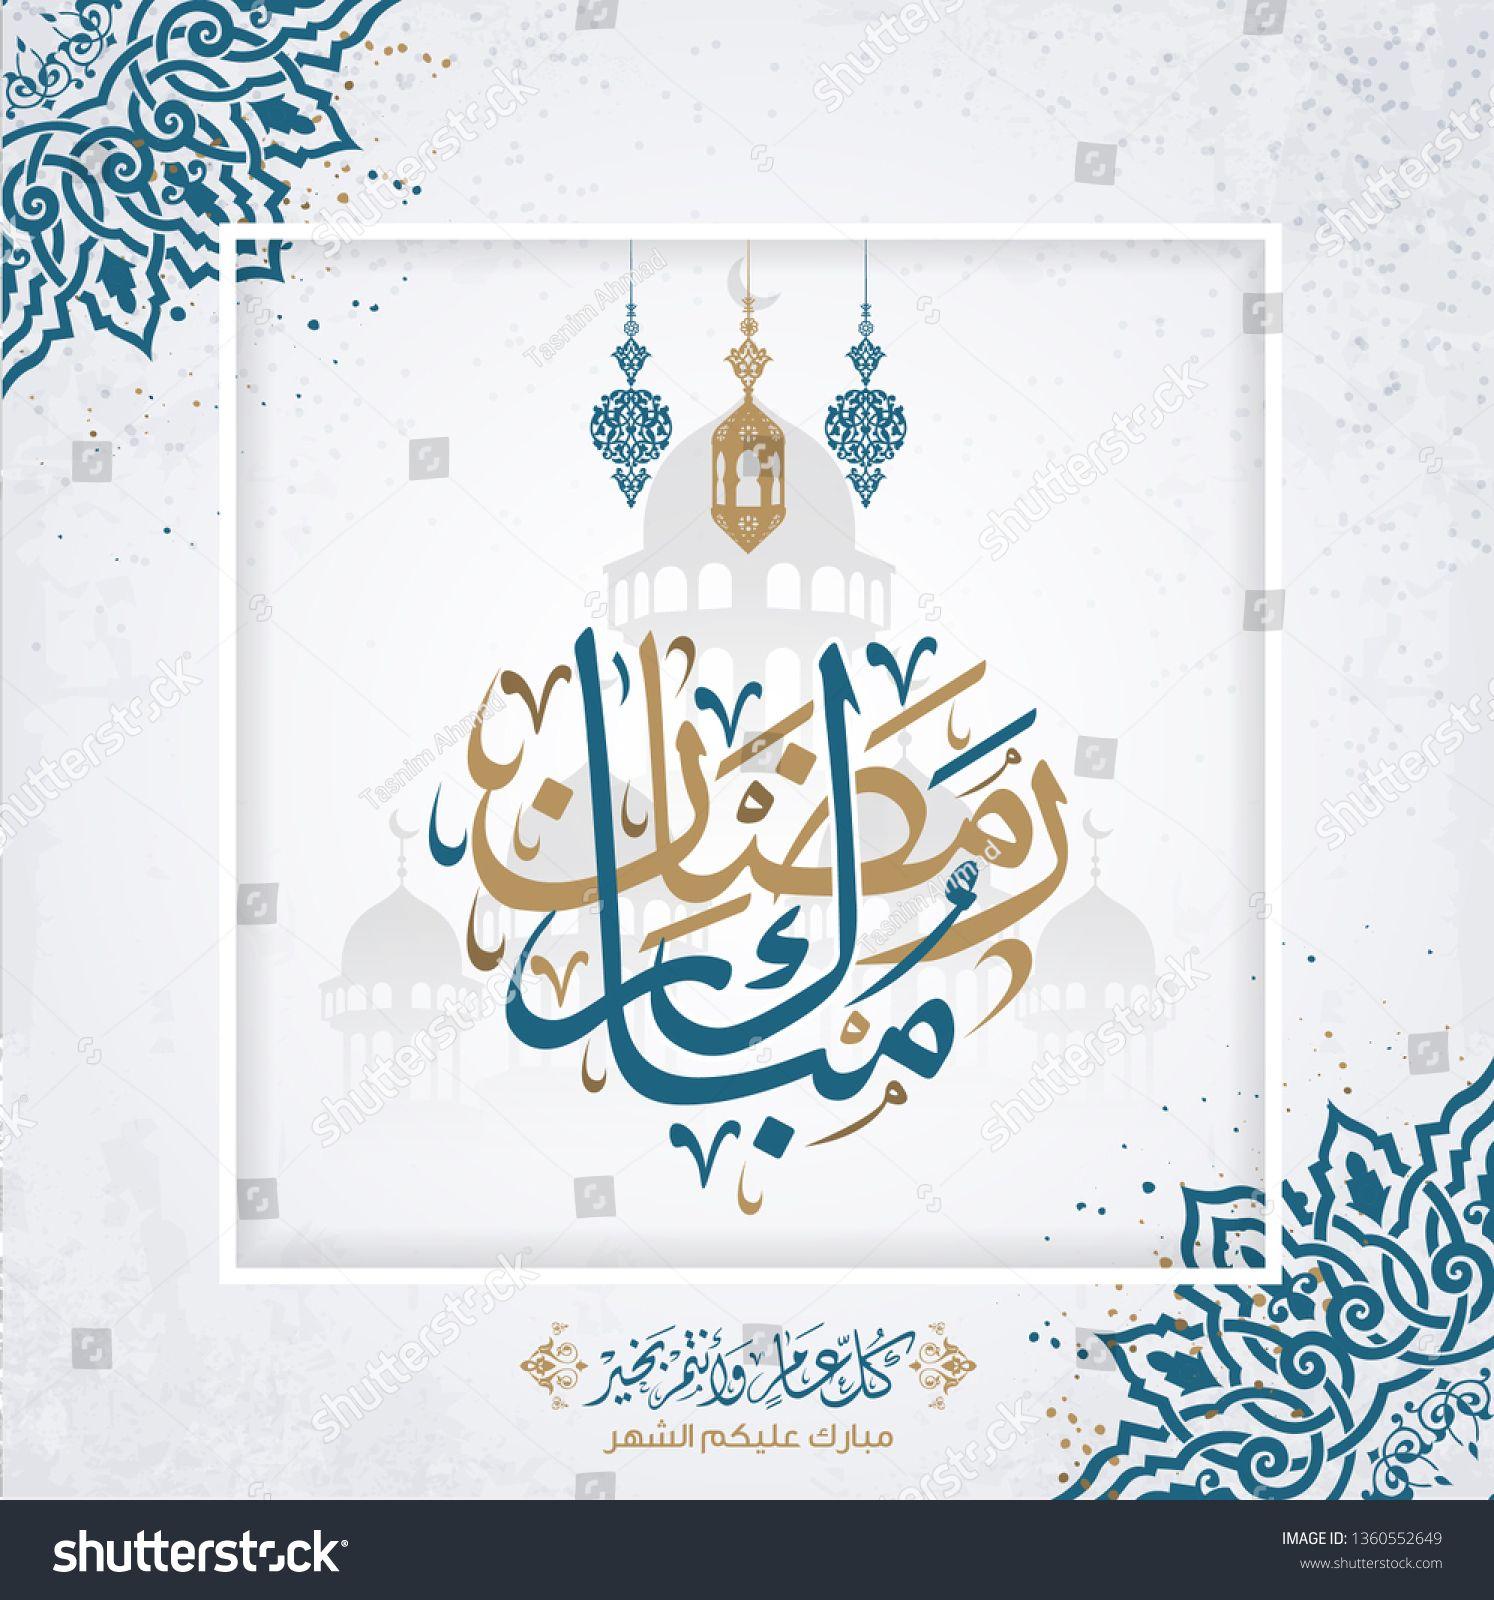 Ramadan Mubarak In Arabic Calligraphy Greeting Card The Arabic Calligraphy Means Generous Ramadan Vector 6 Spons Ramadan Greetings Ramadan Free Instagram